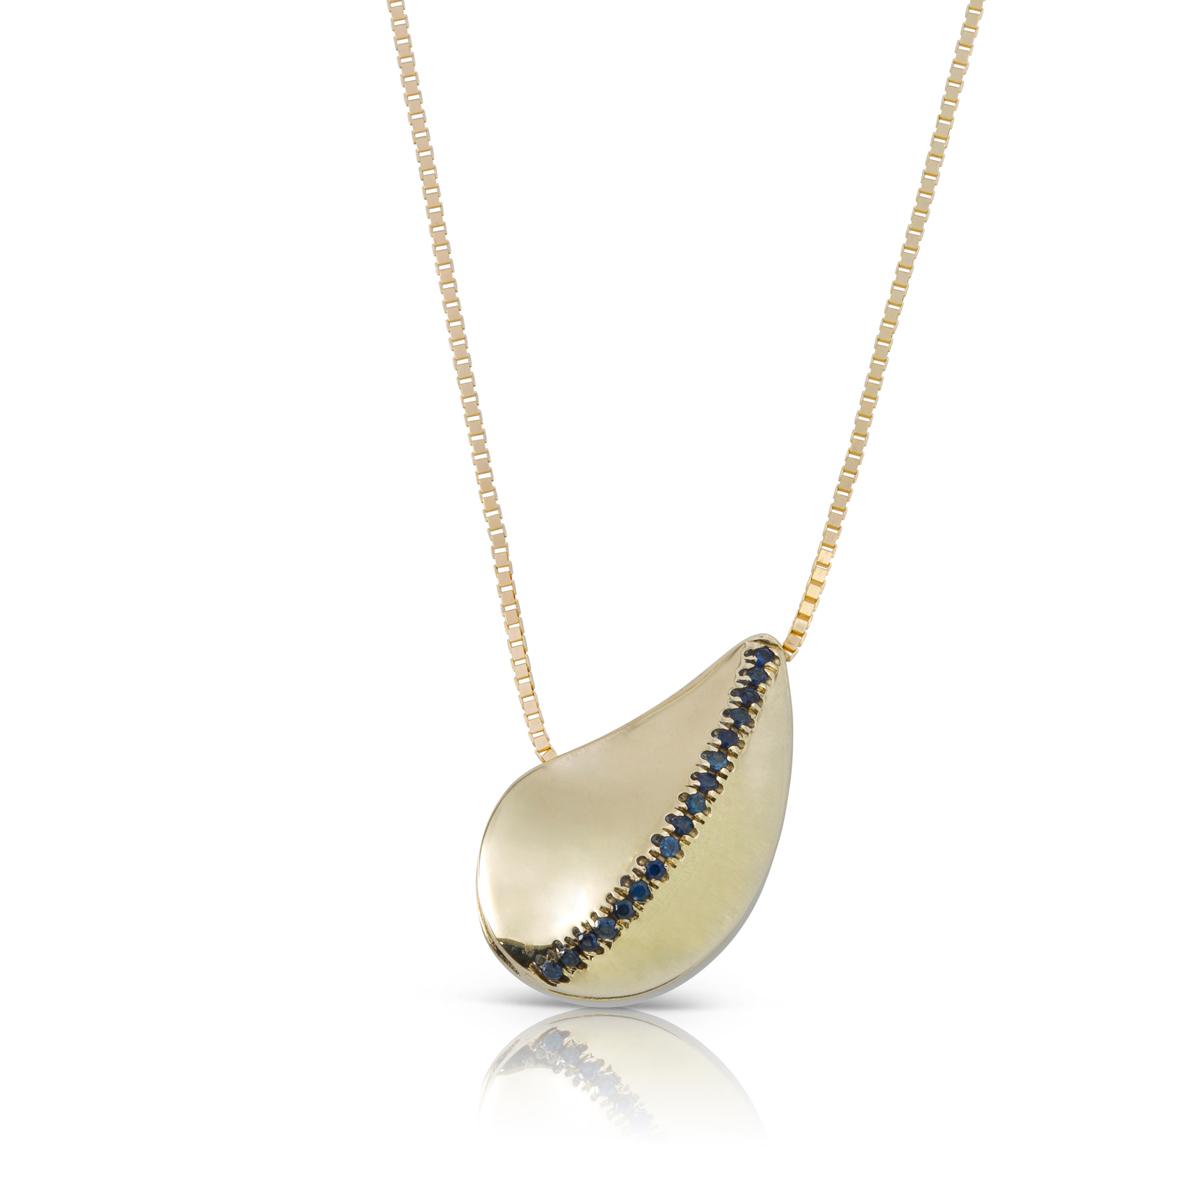 Gold and gems leaf shaped necklace